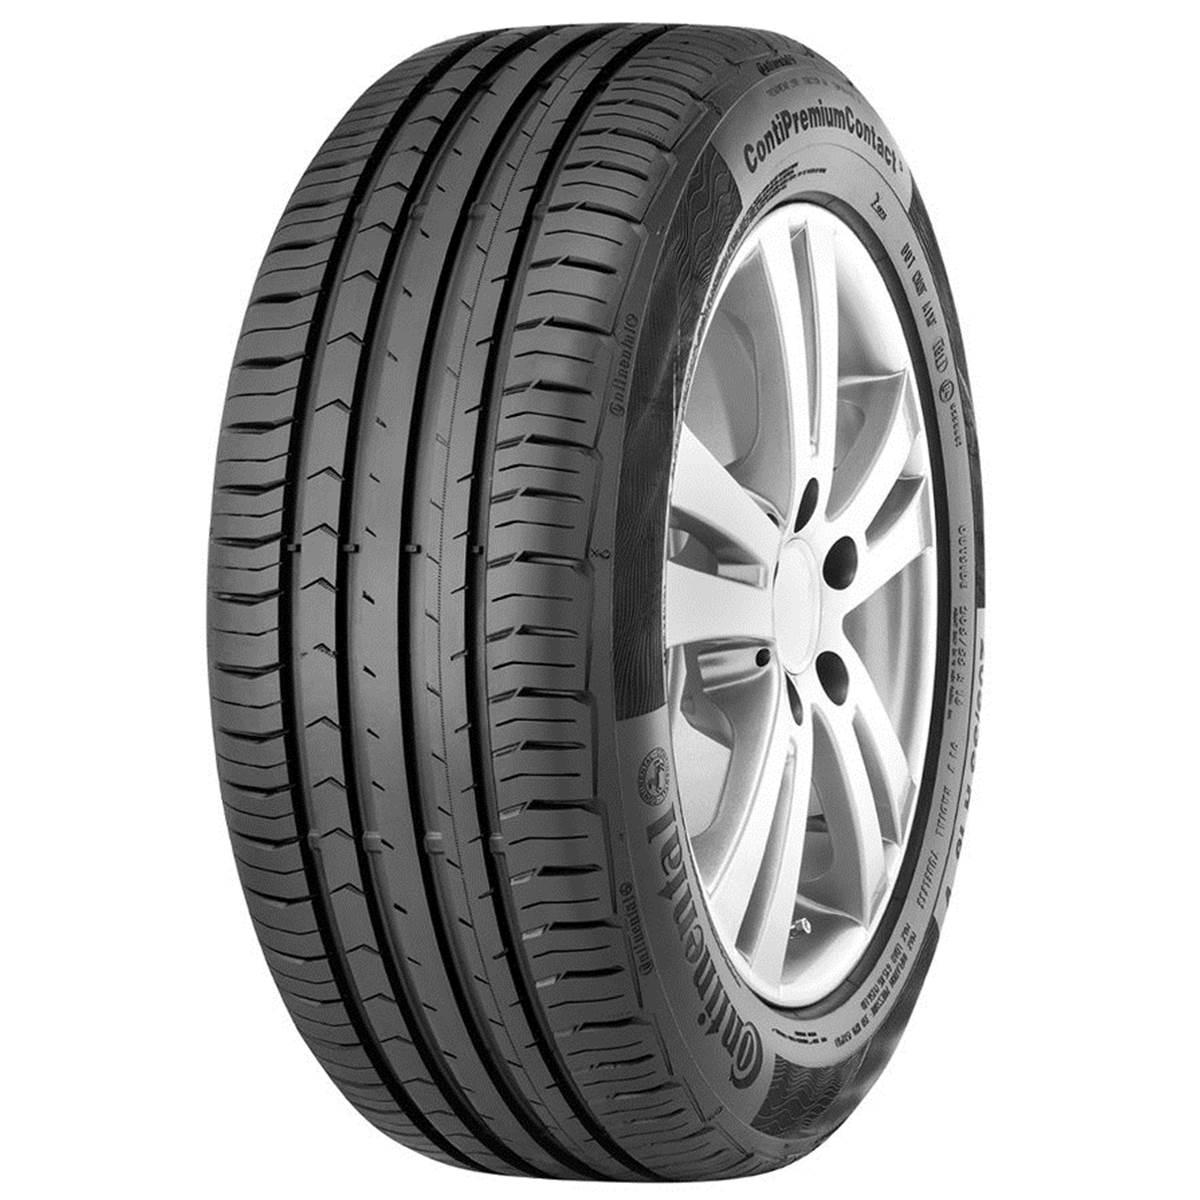 pneu continental 235 55 r17 99v m+s